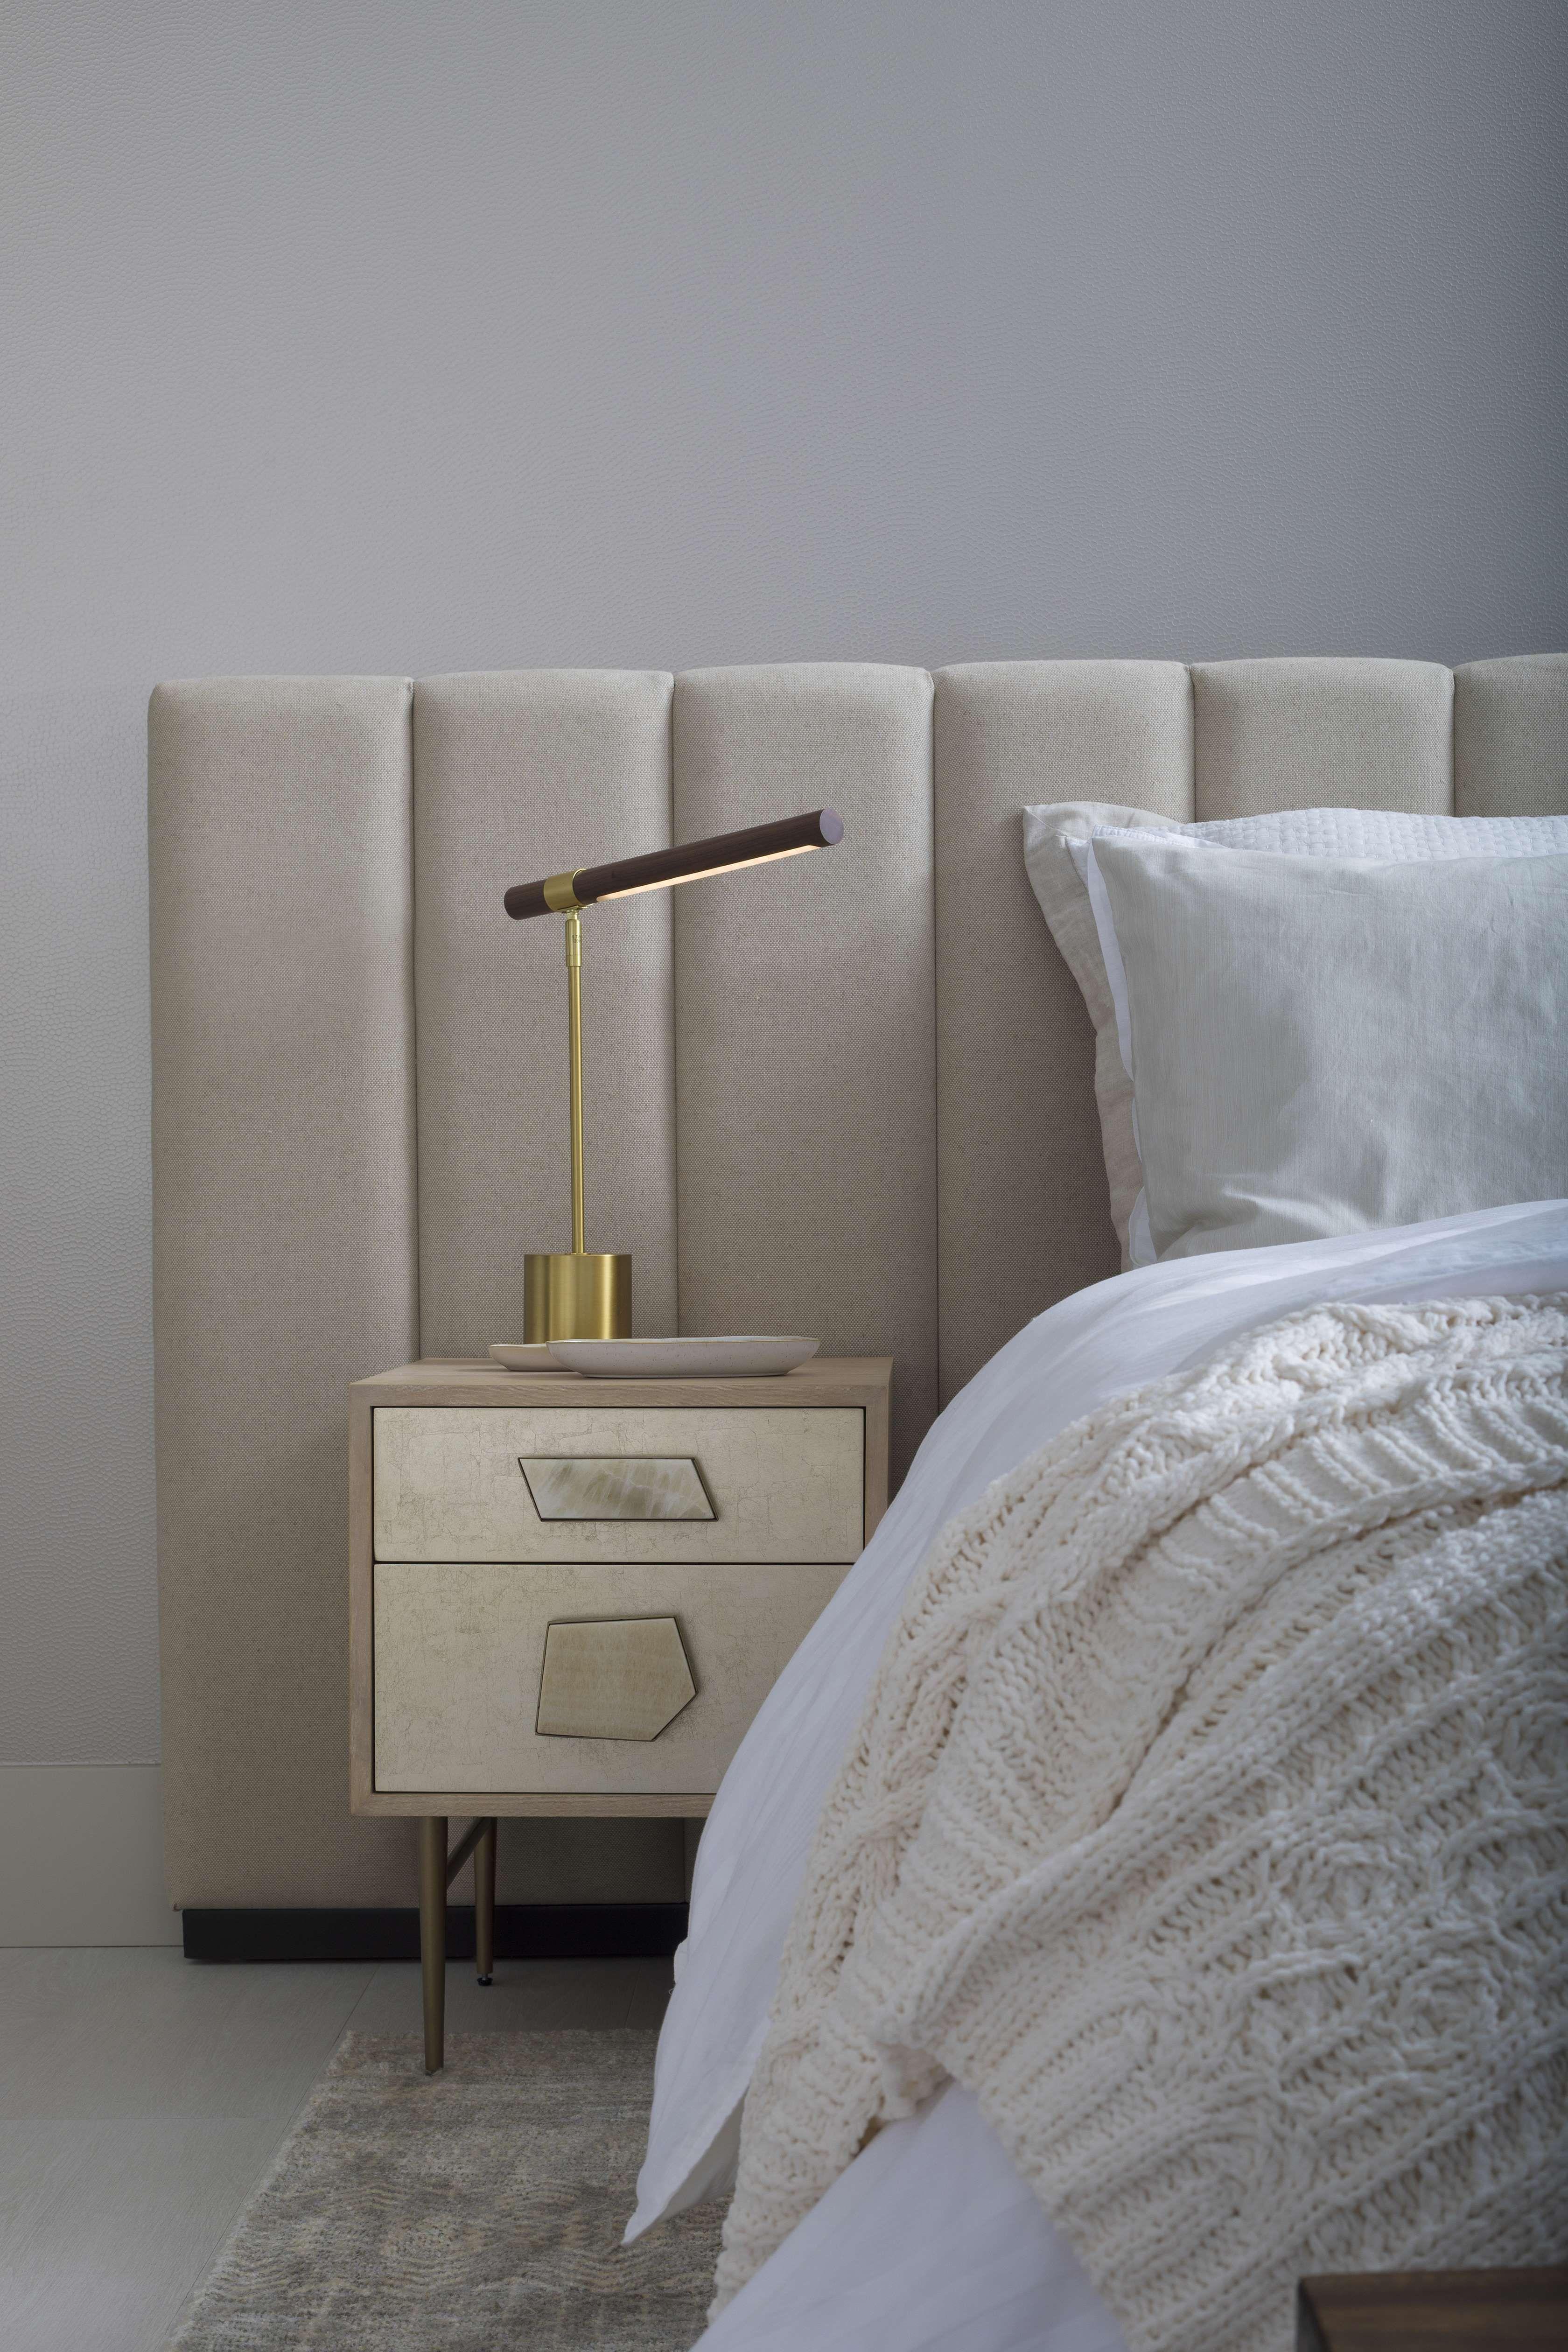 francis upholstered panel headboard on condo design by dkor interiors modern coastal design bed headboard design bedroom headboard bedroom interior pinterest